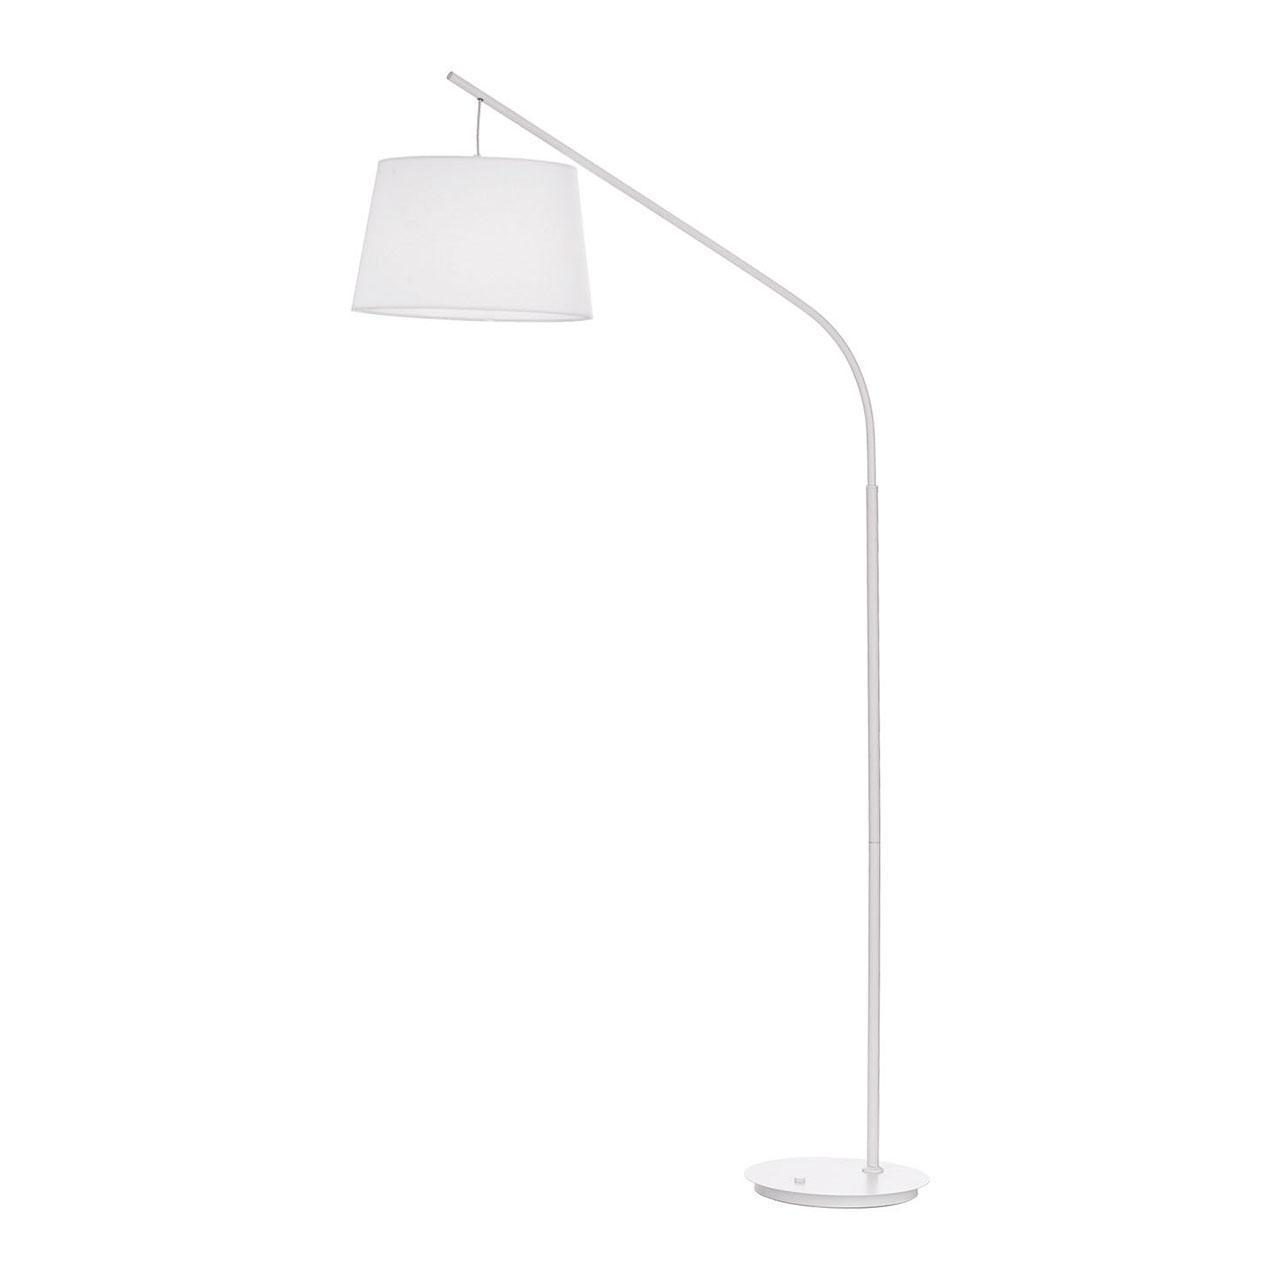 цена на Торшер Ideal Lux Daddy PT1 Bianco